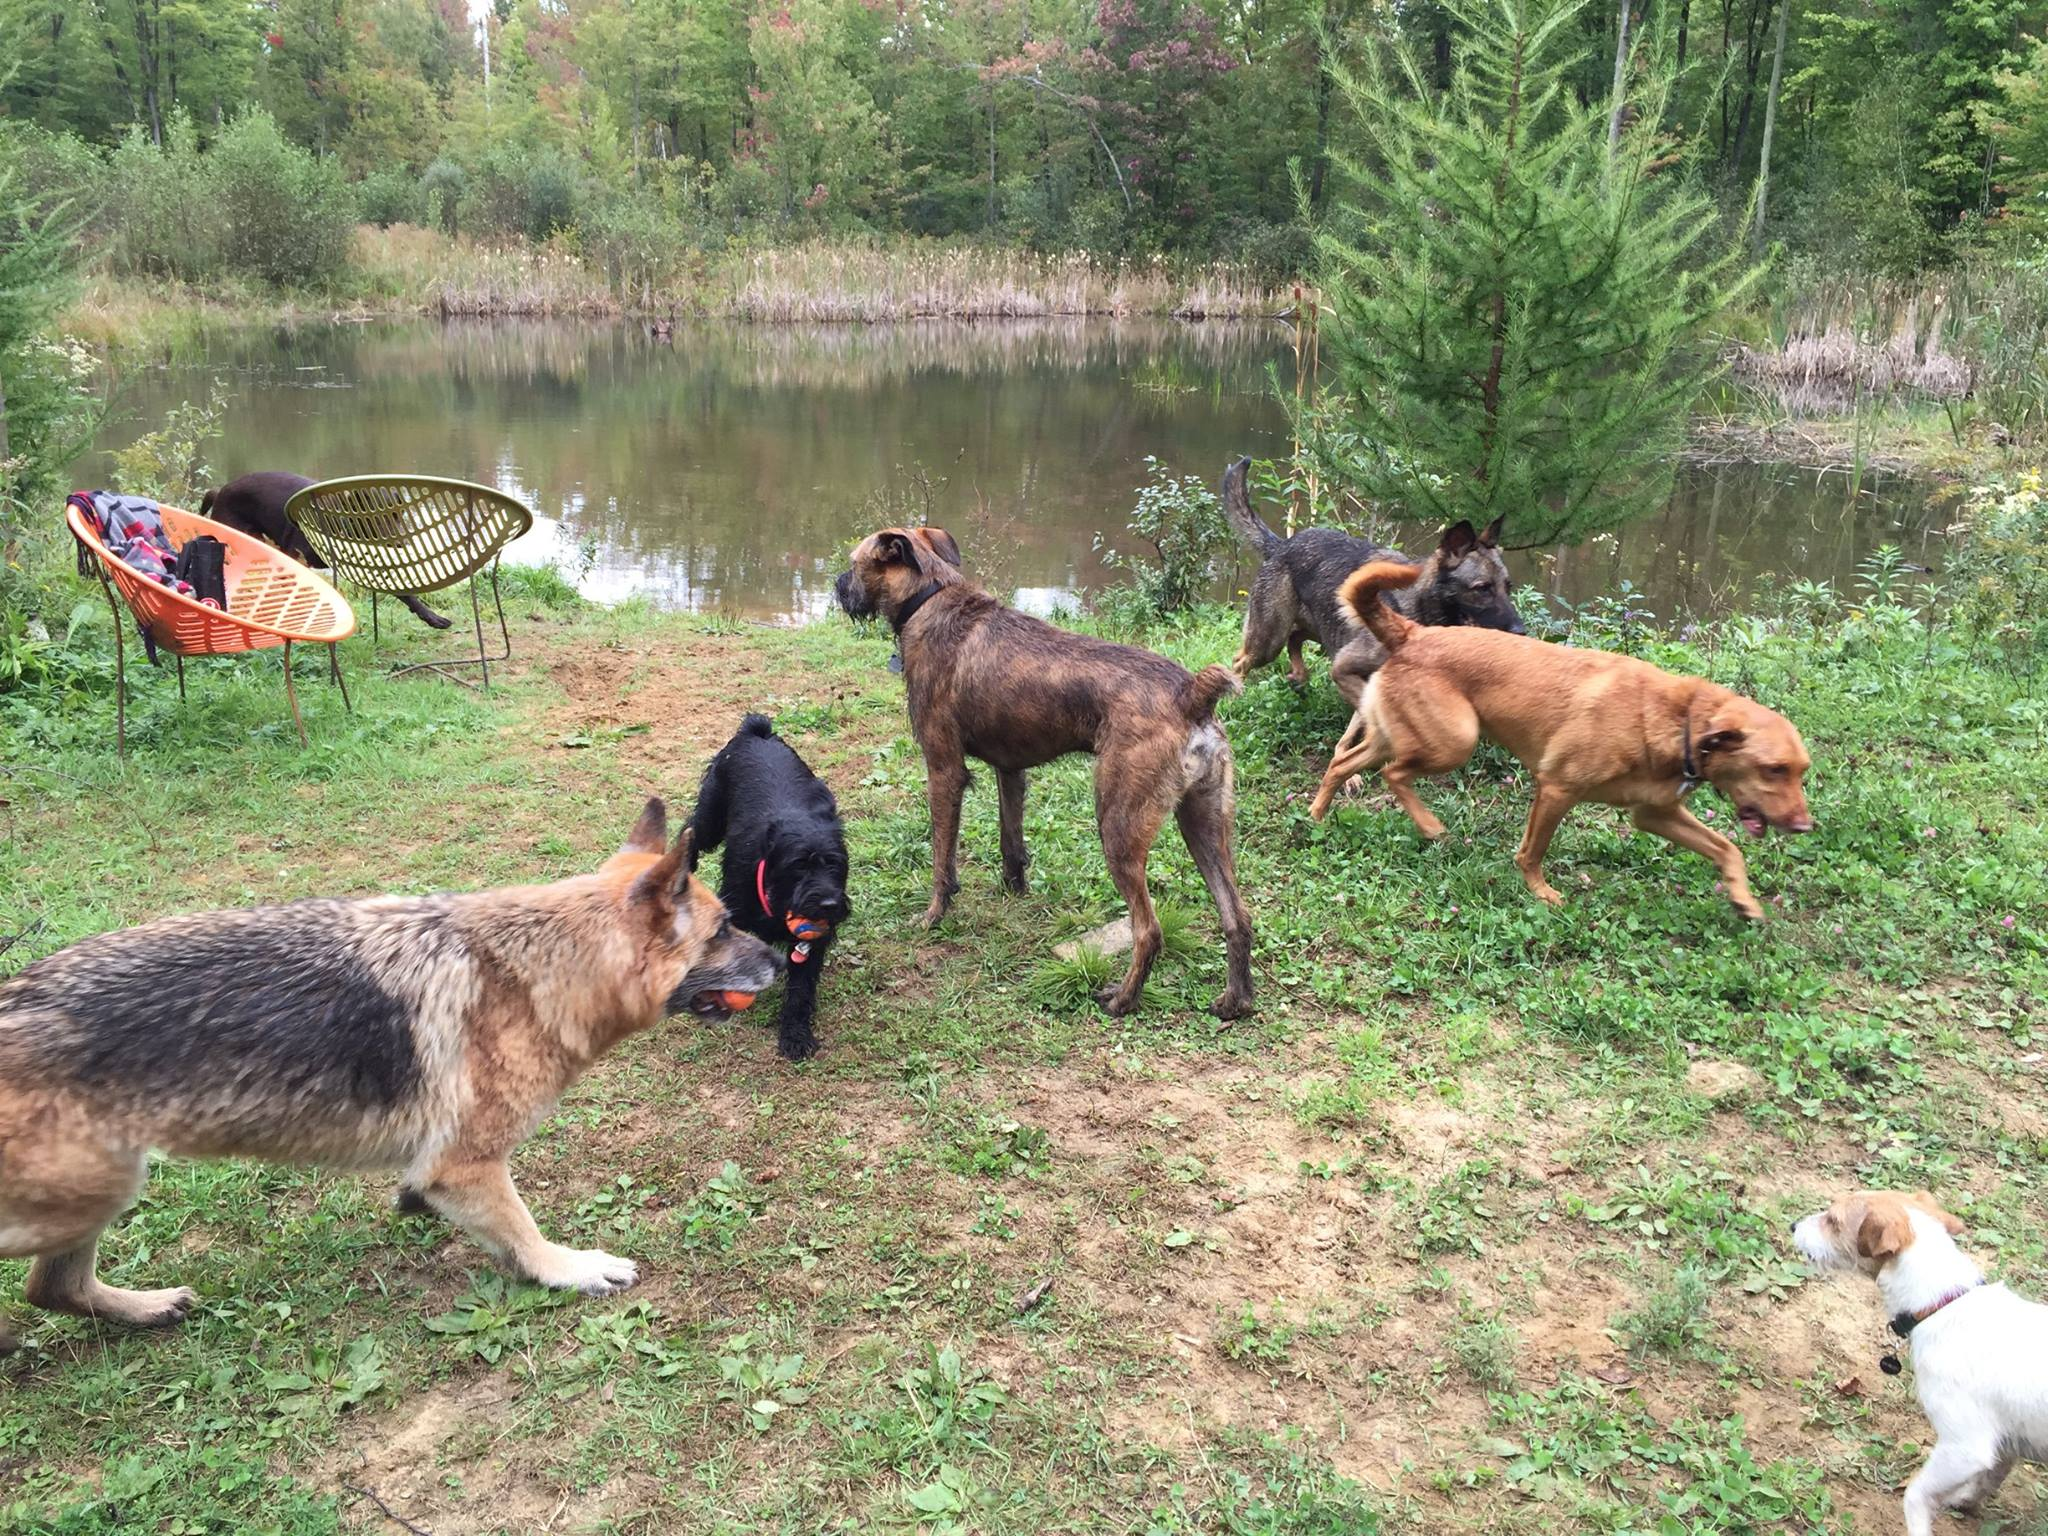 Dogs taking a break from training